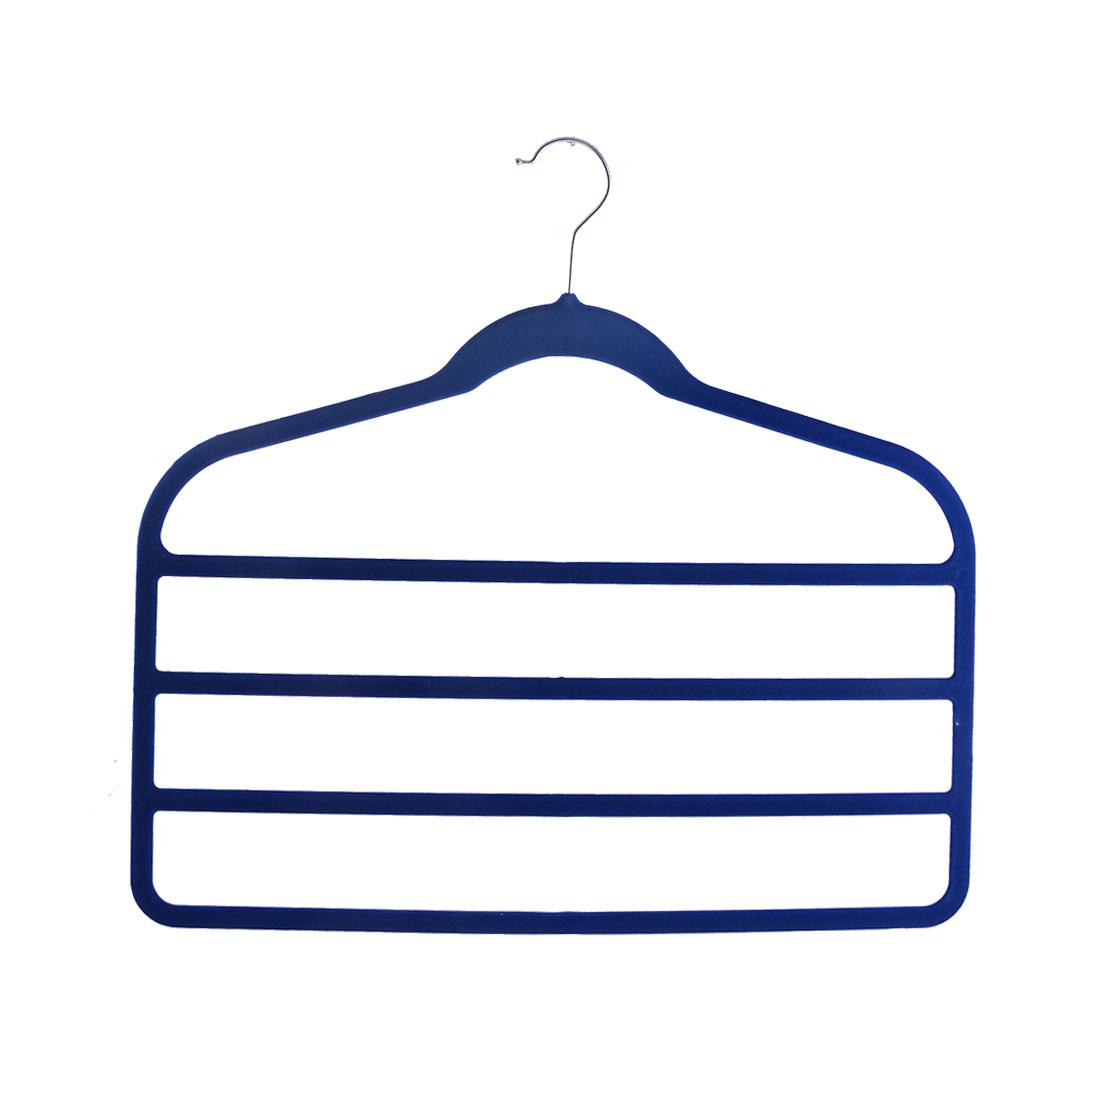 Home Velvet Anti-slip Shawl Coat Towel Clothes Trousers Holder Rack Organizer Blue